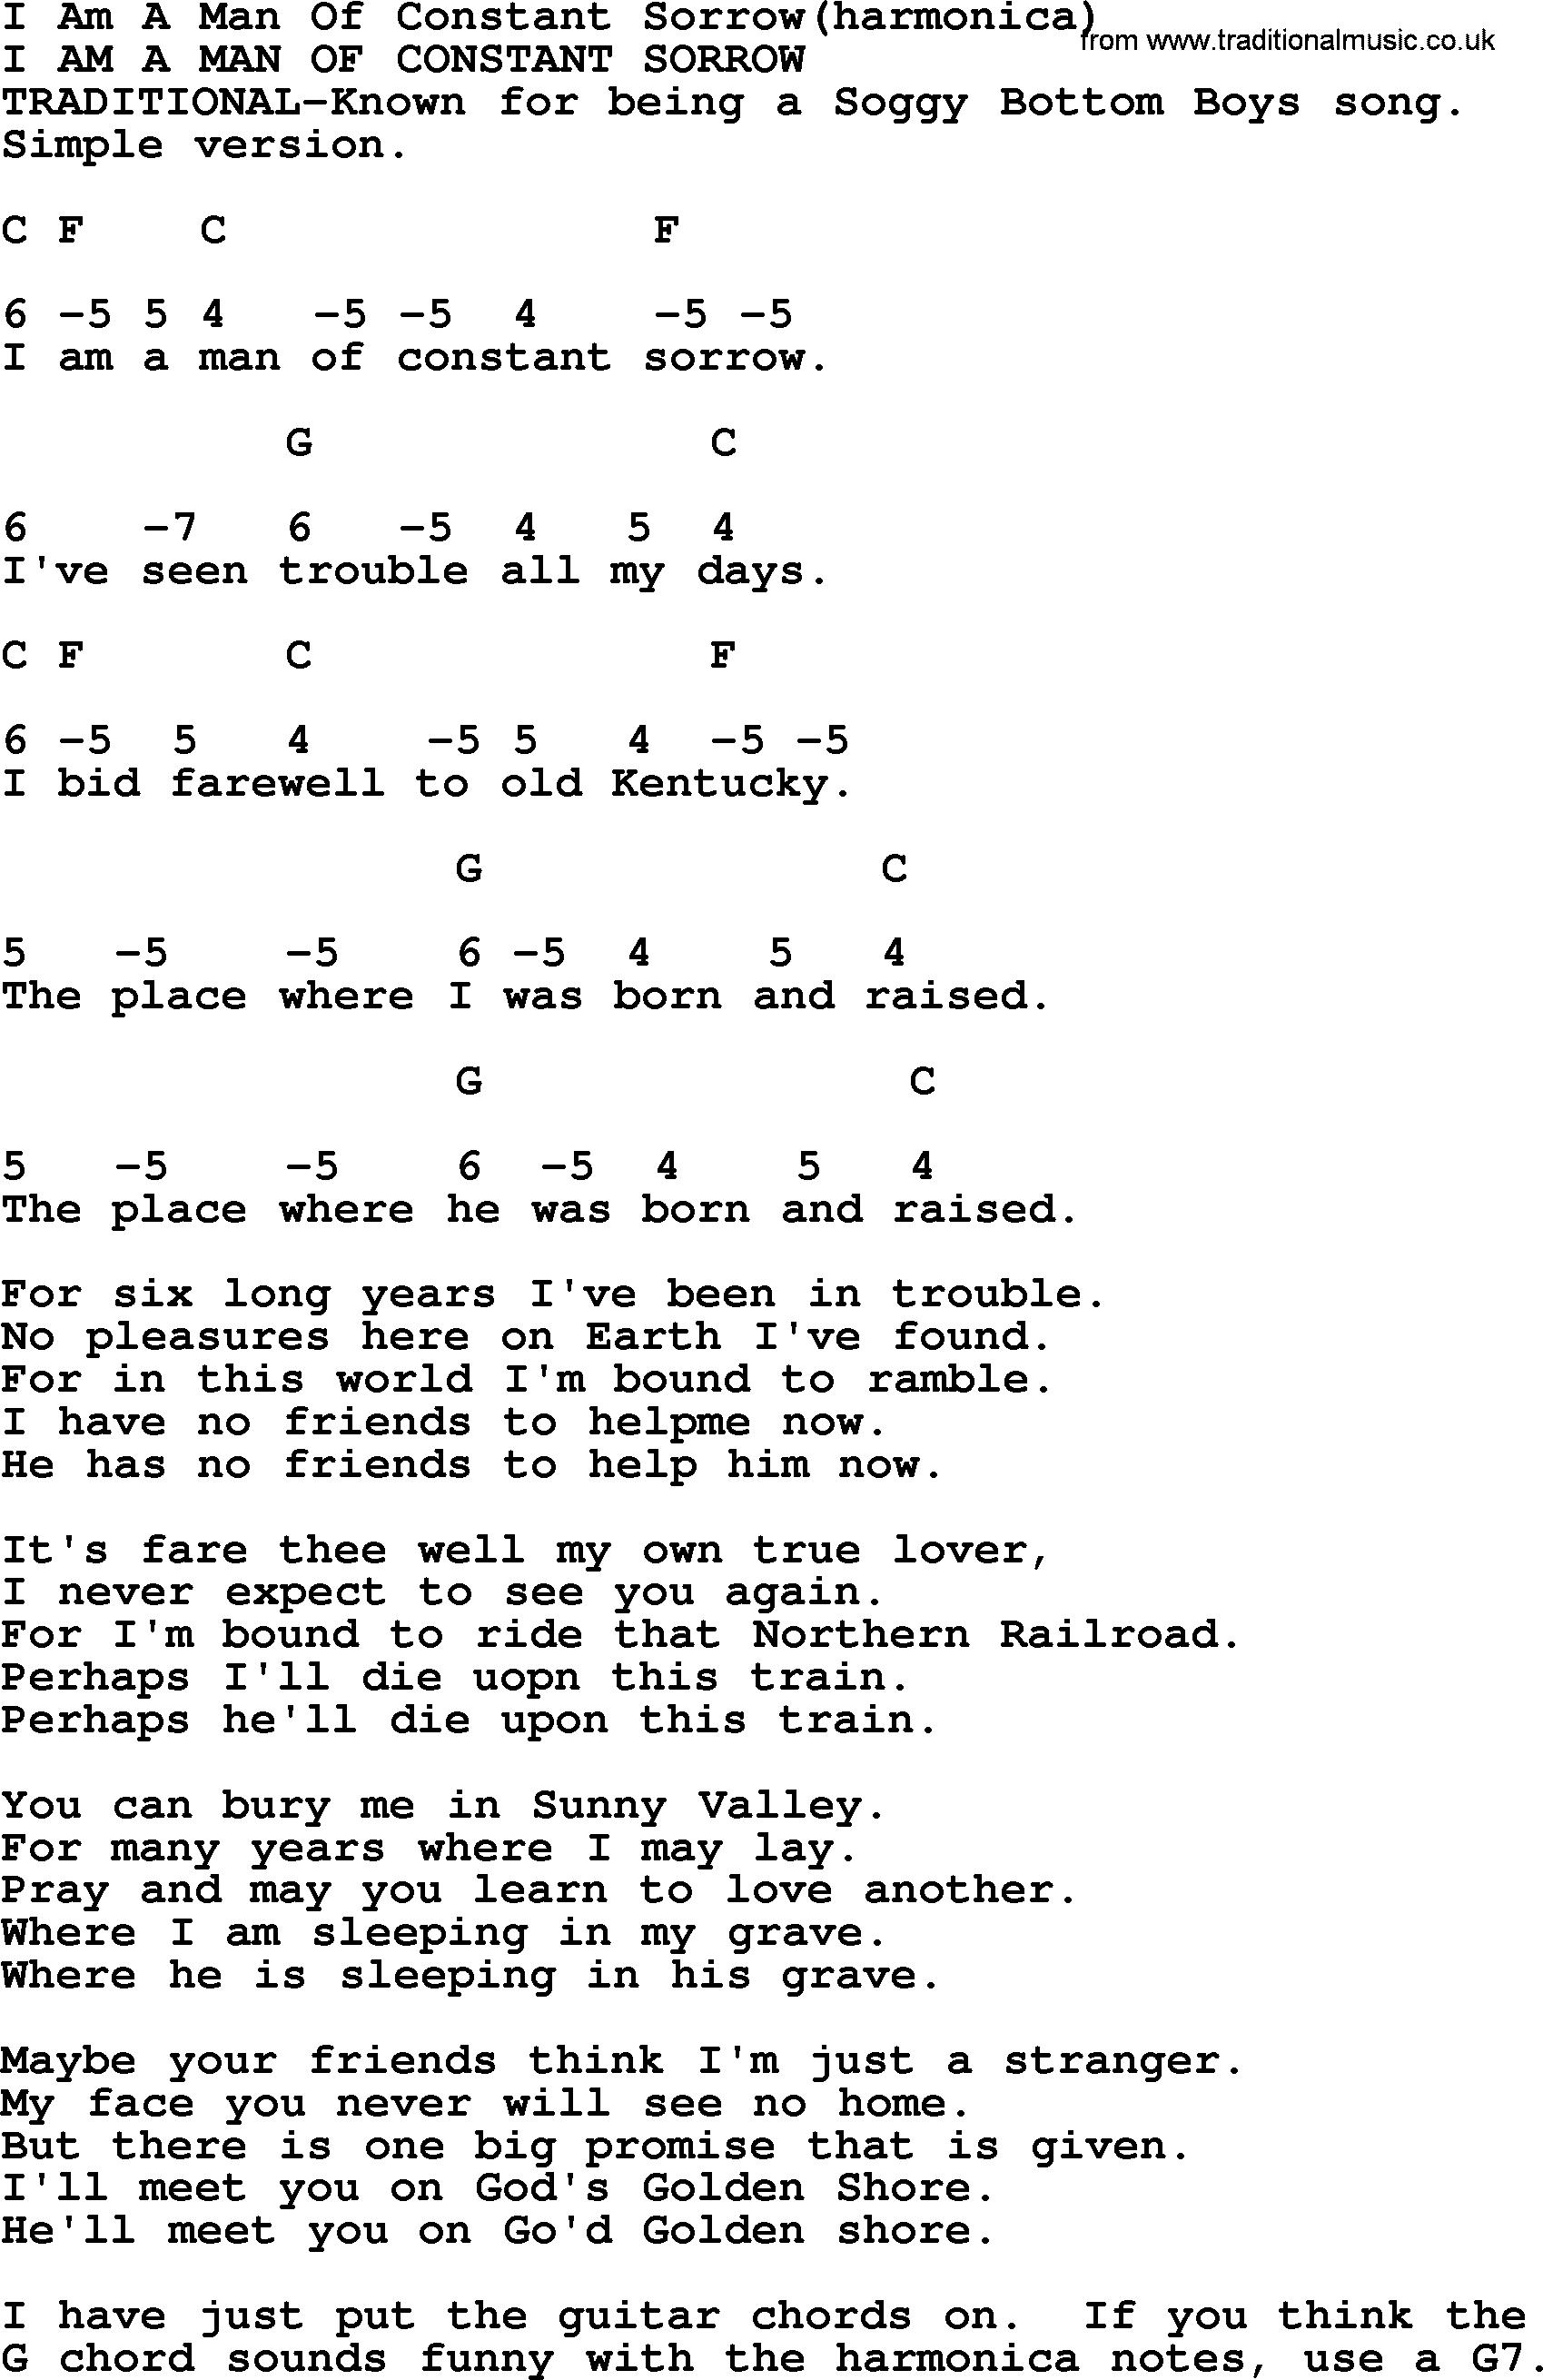 Man of constant sorrow lyrics soggy bottom